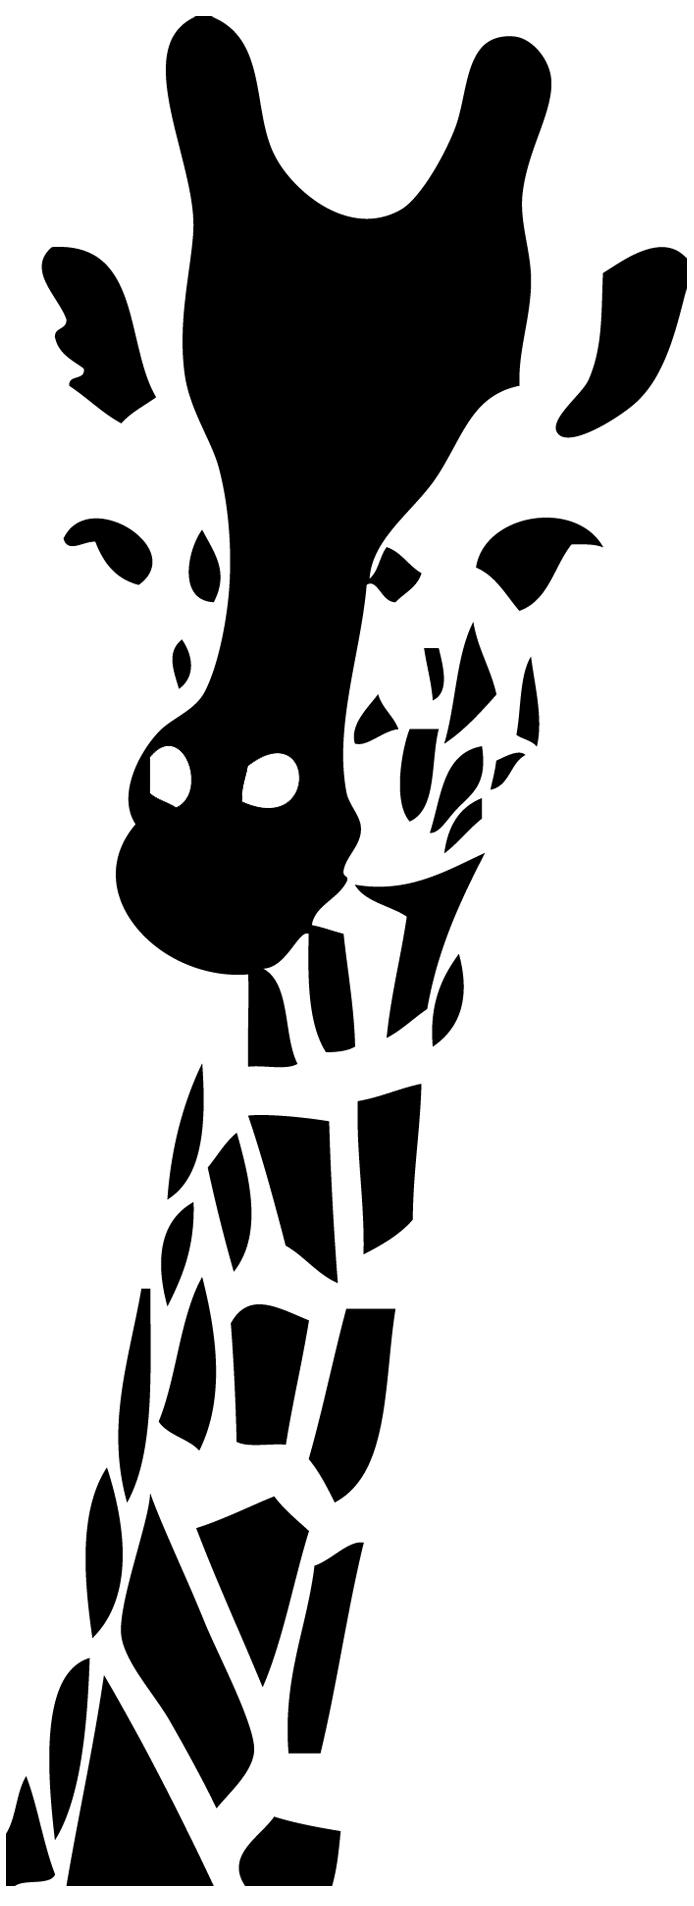 stickers t te de girafe animaux sauvage destock stickers. Black Bedroom Furniture Sets. Home Design Ideas